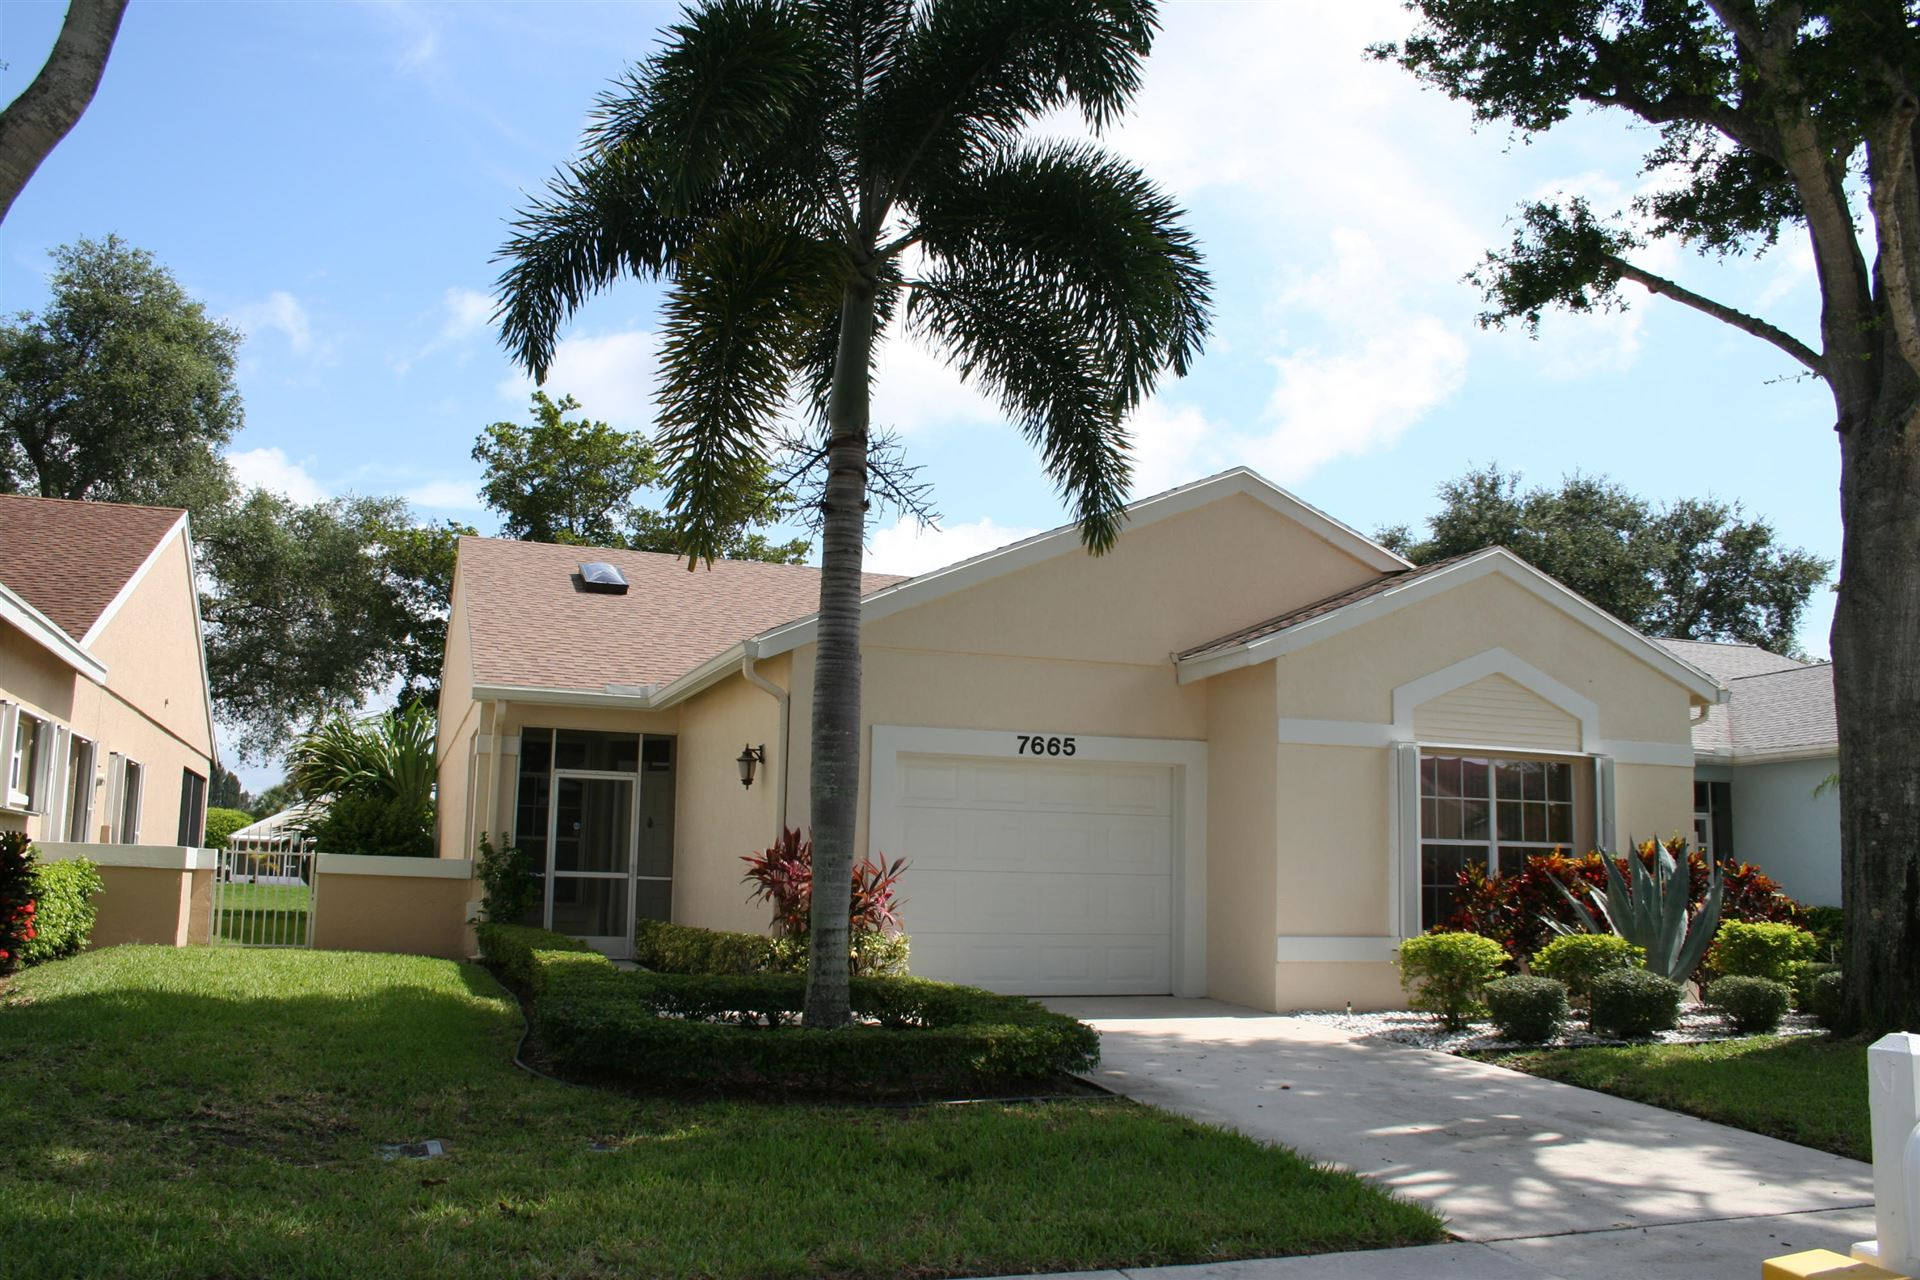 7665 Mansfield Hollow Road, Delray Beach, FL 33446 - #: RX-10638403